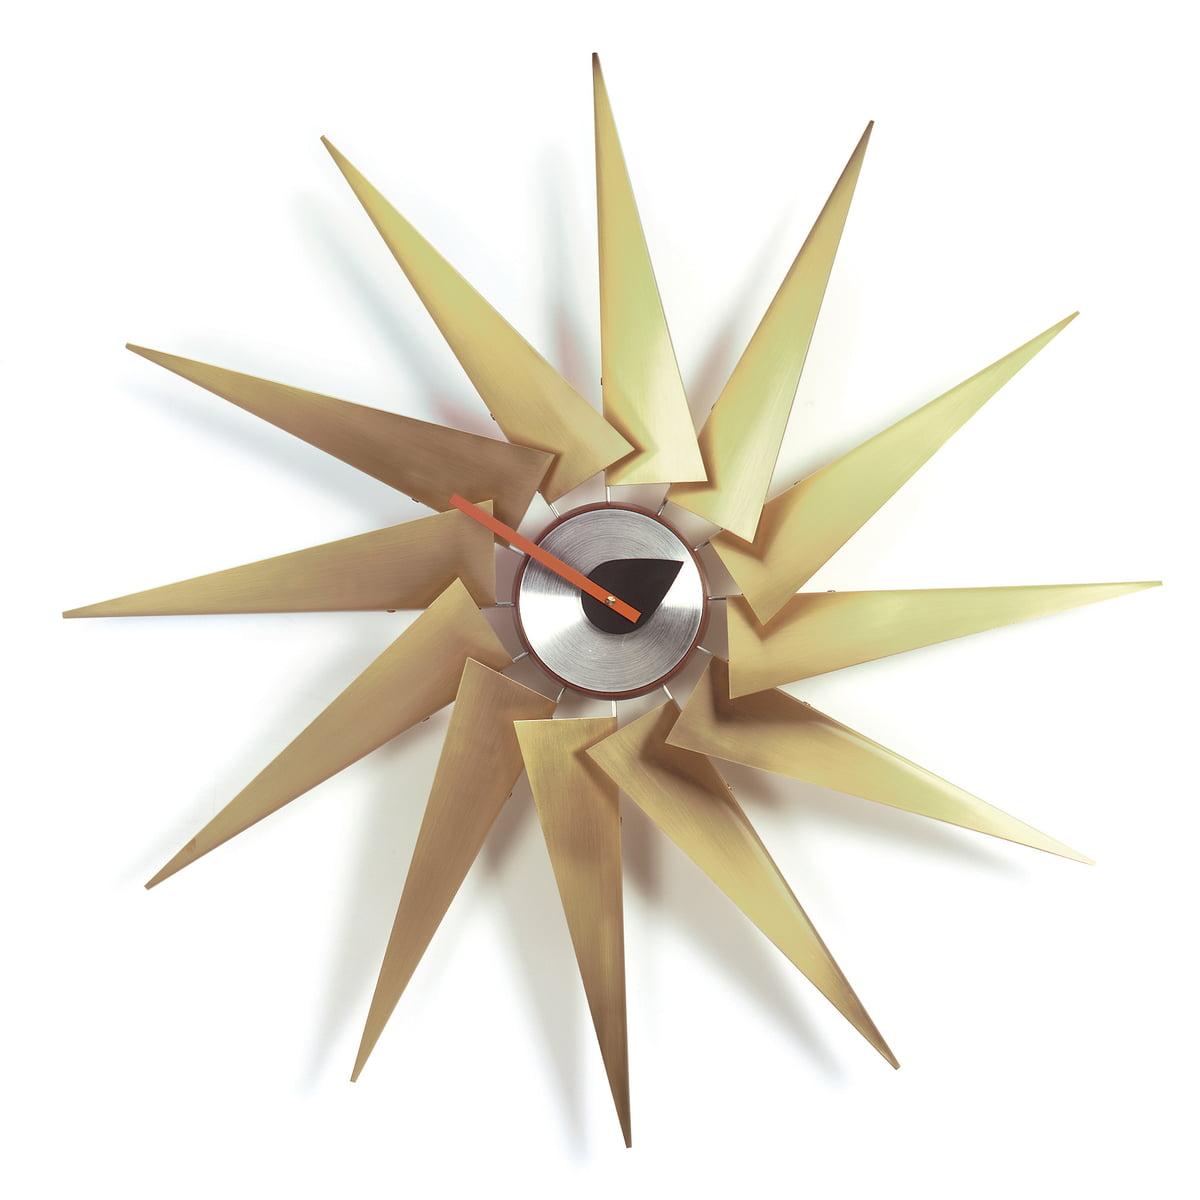 Turbine clock freisteller